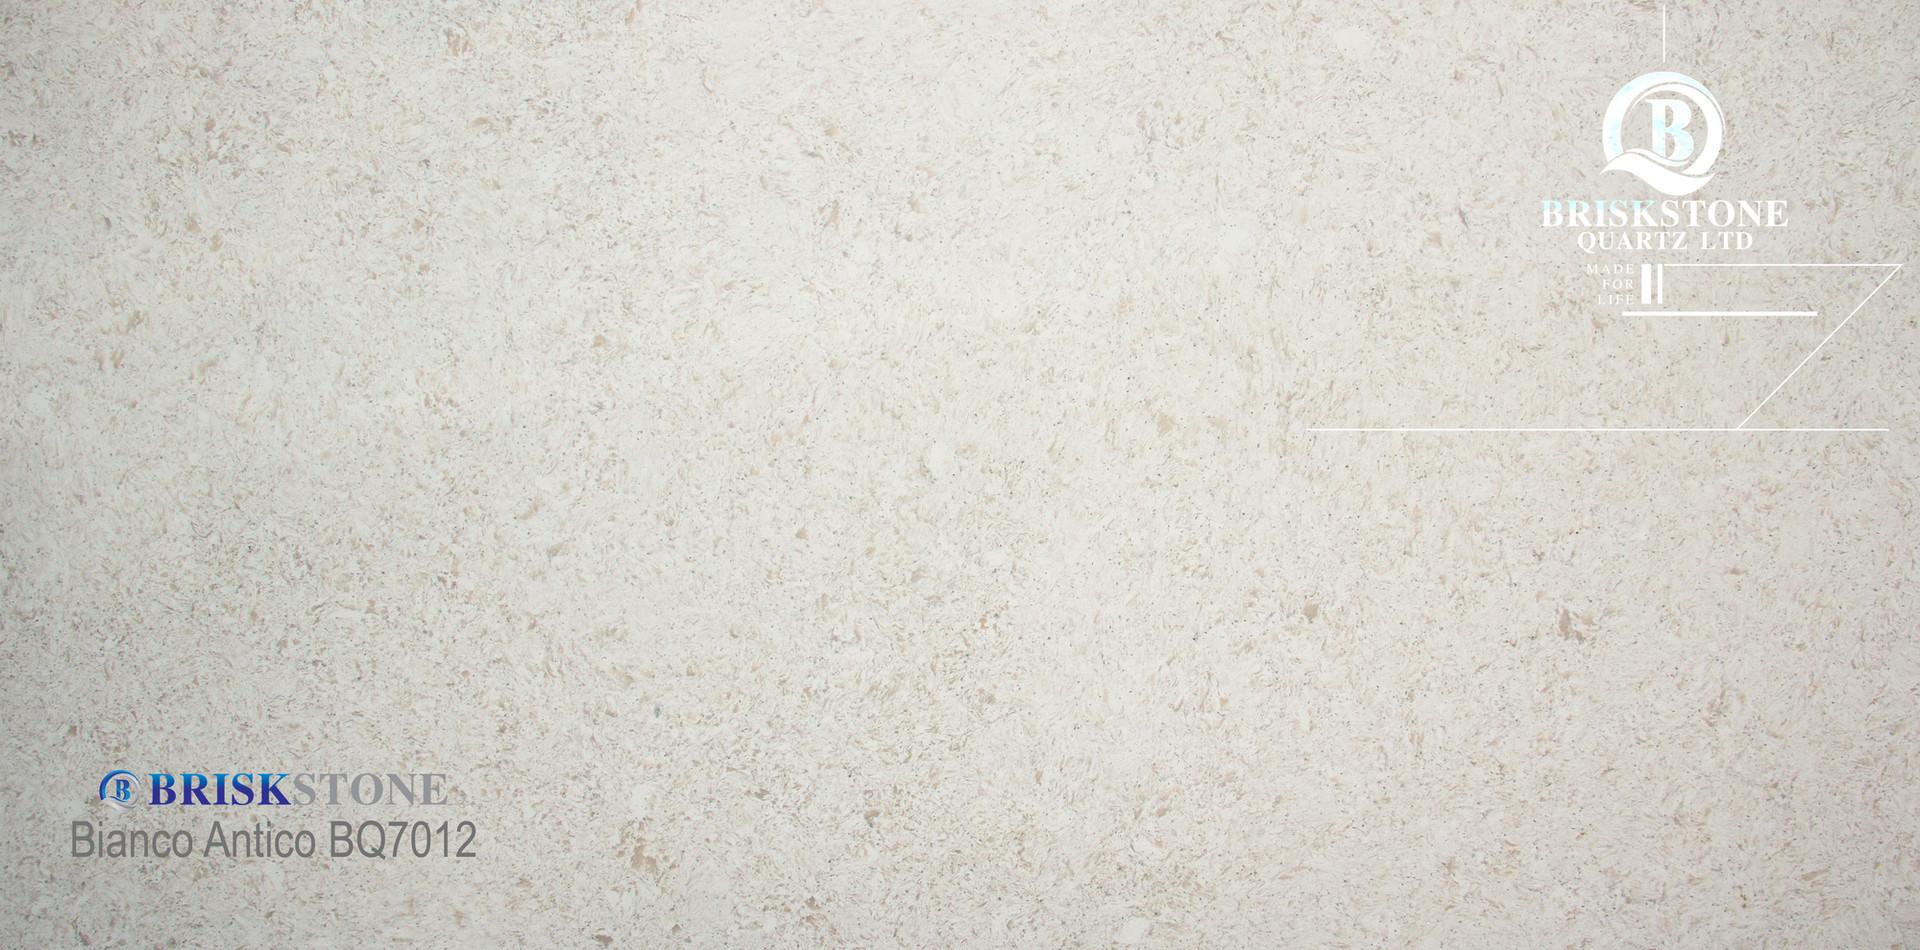 Bianco Antico BQ7012 slab.jpg